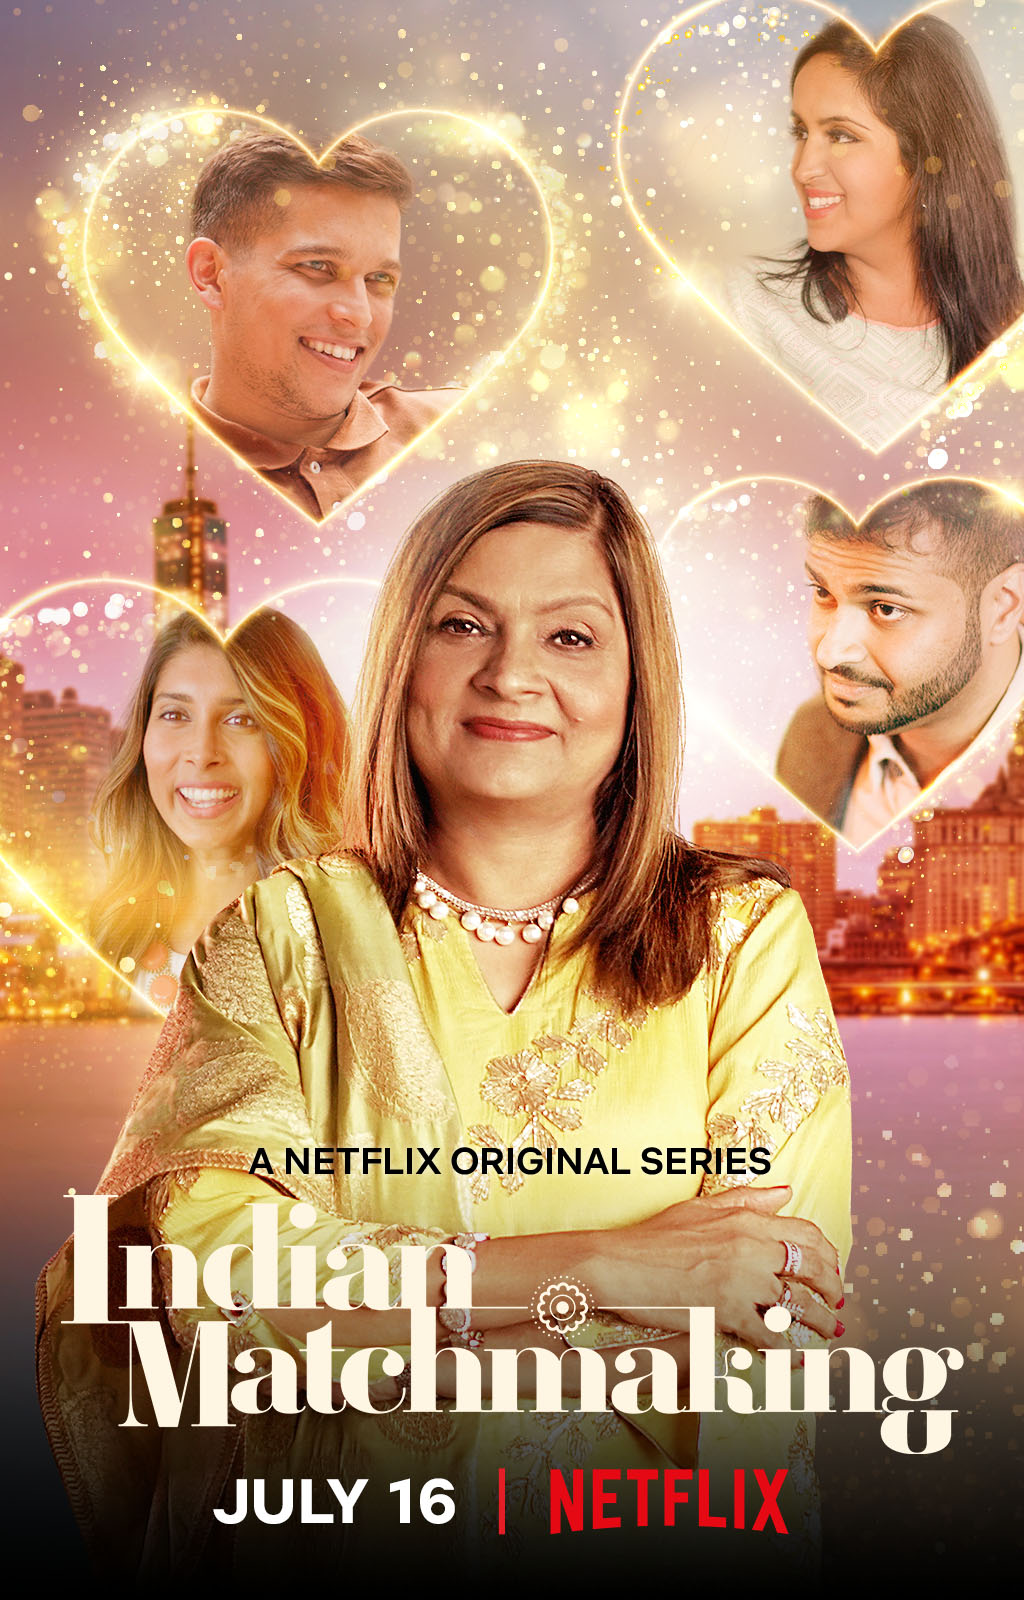 New Show: Netflix's Indian Matchmaking